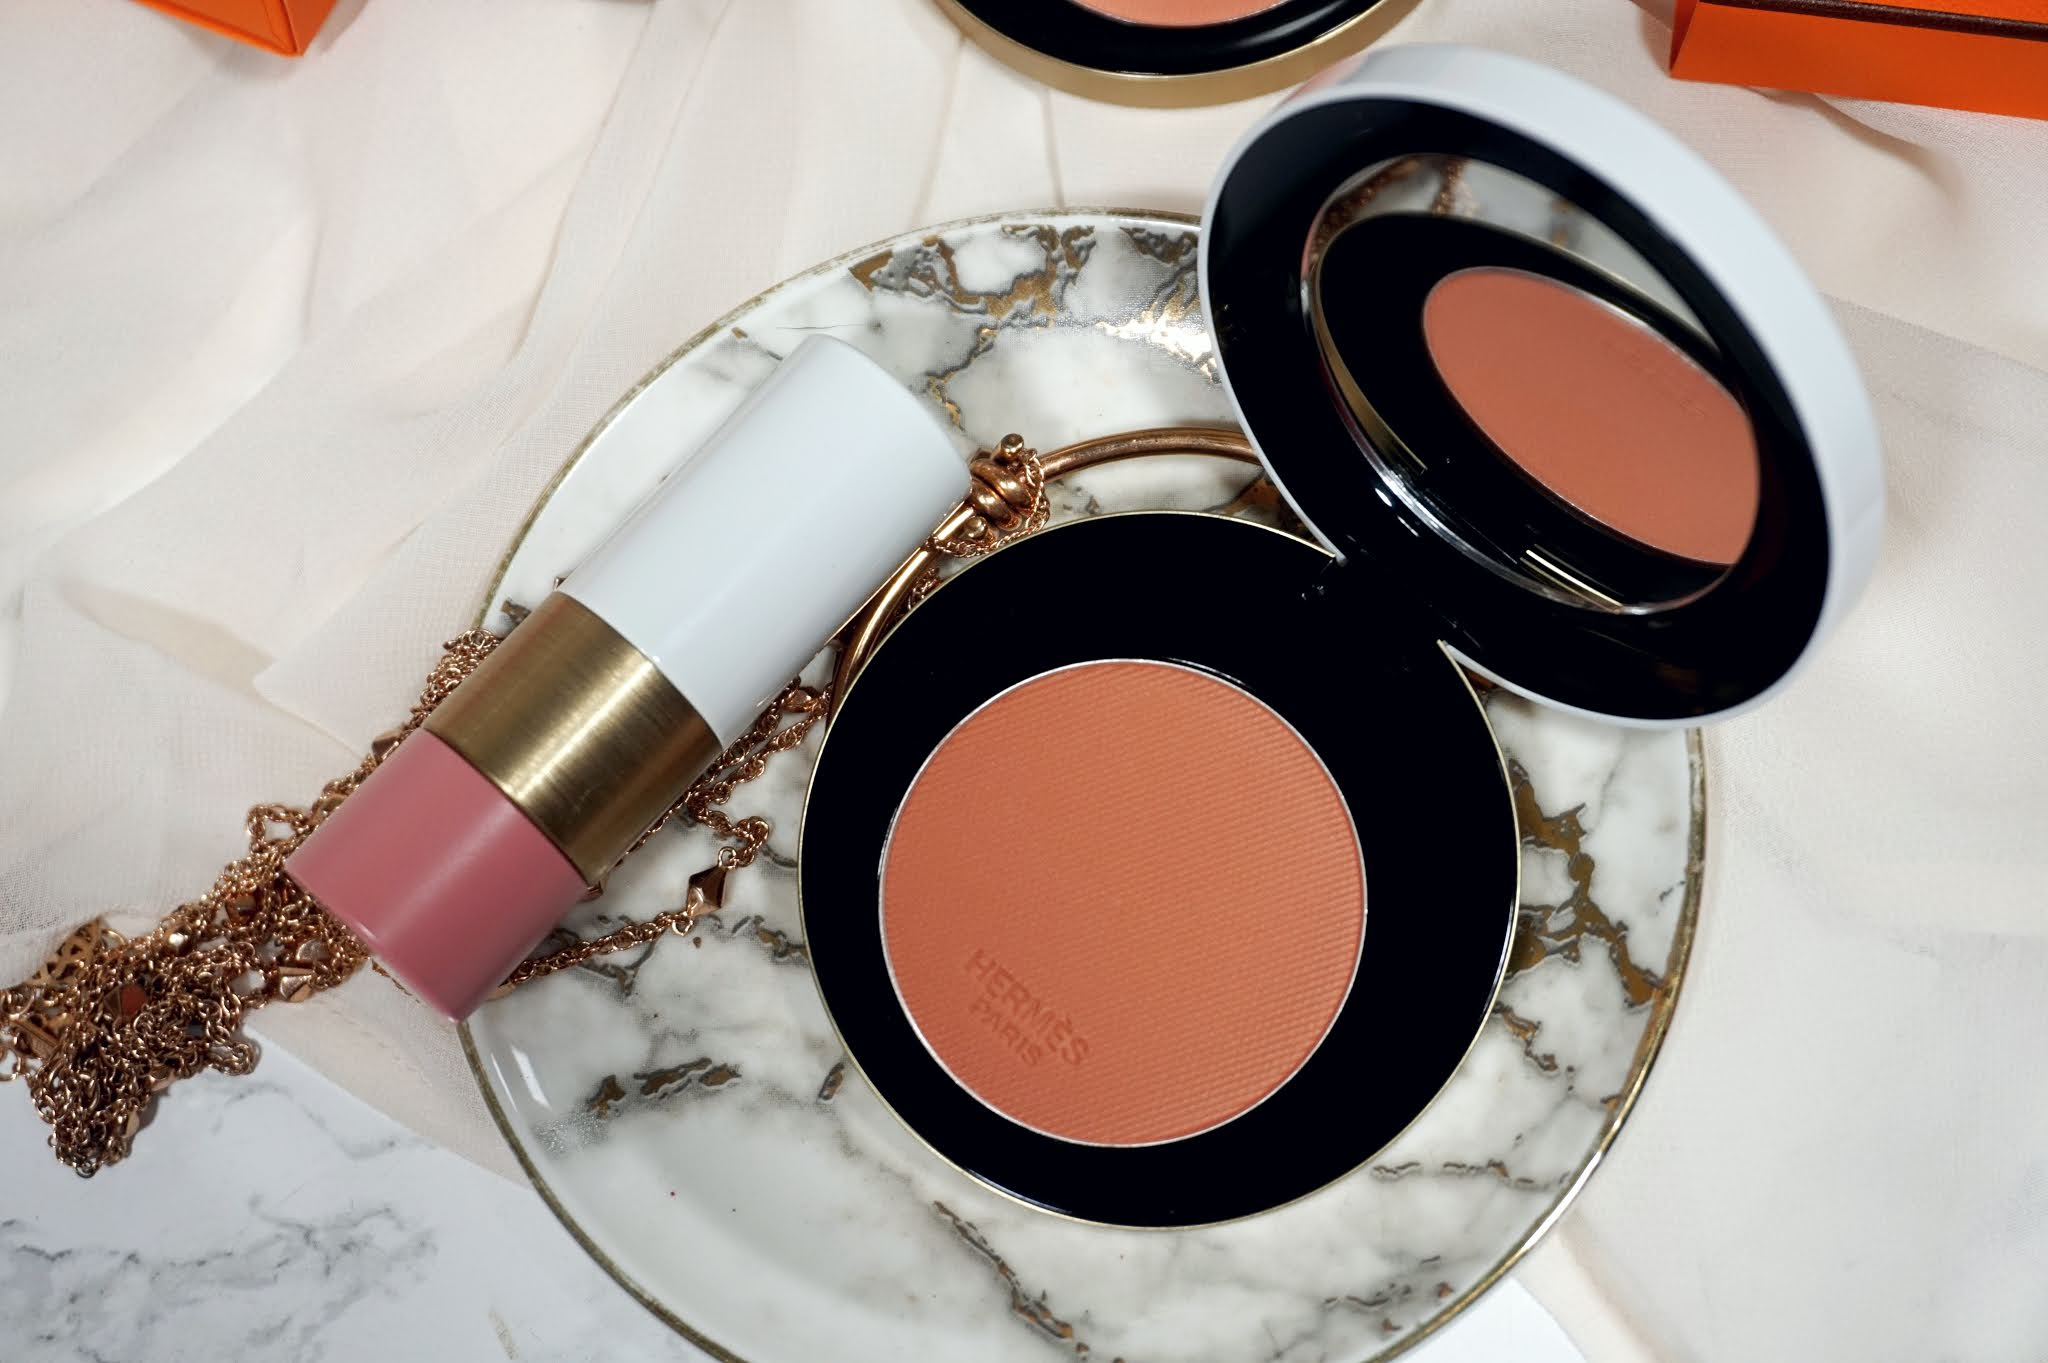 Hermès Rose Hermès - Silky Blush Powder Review and Swatches